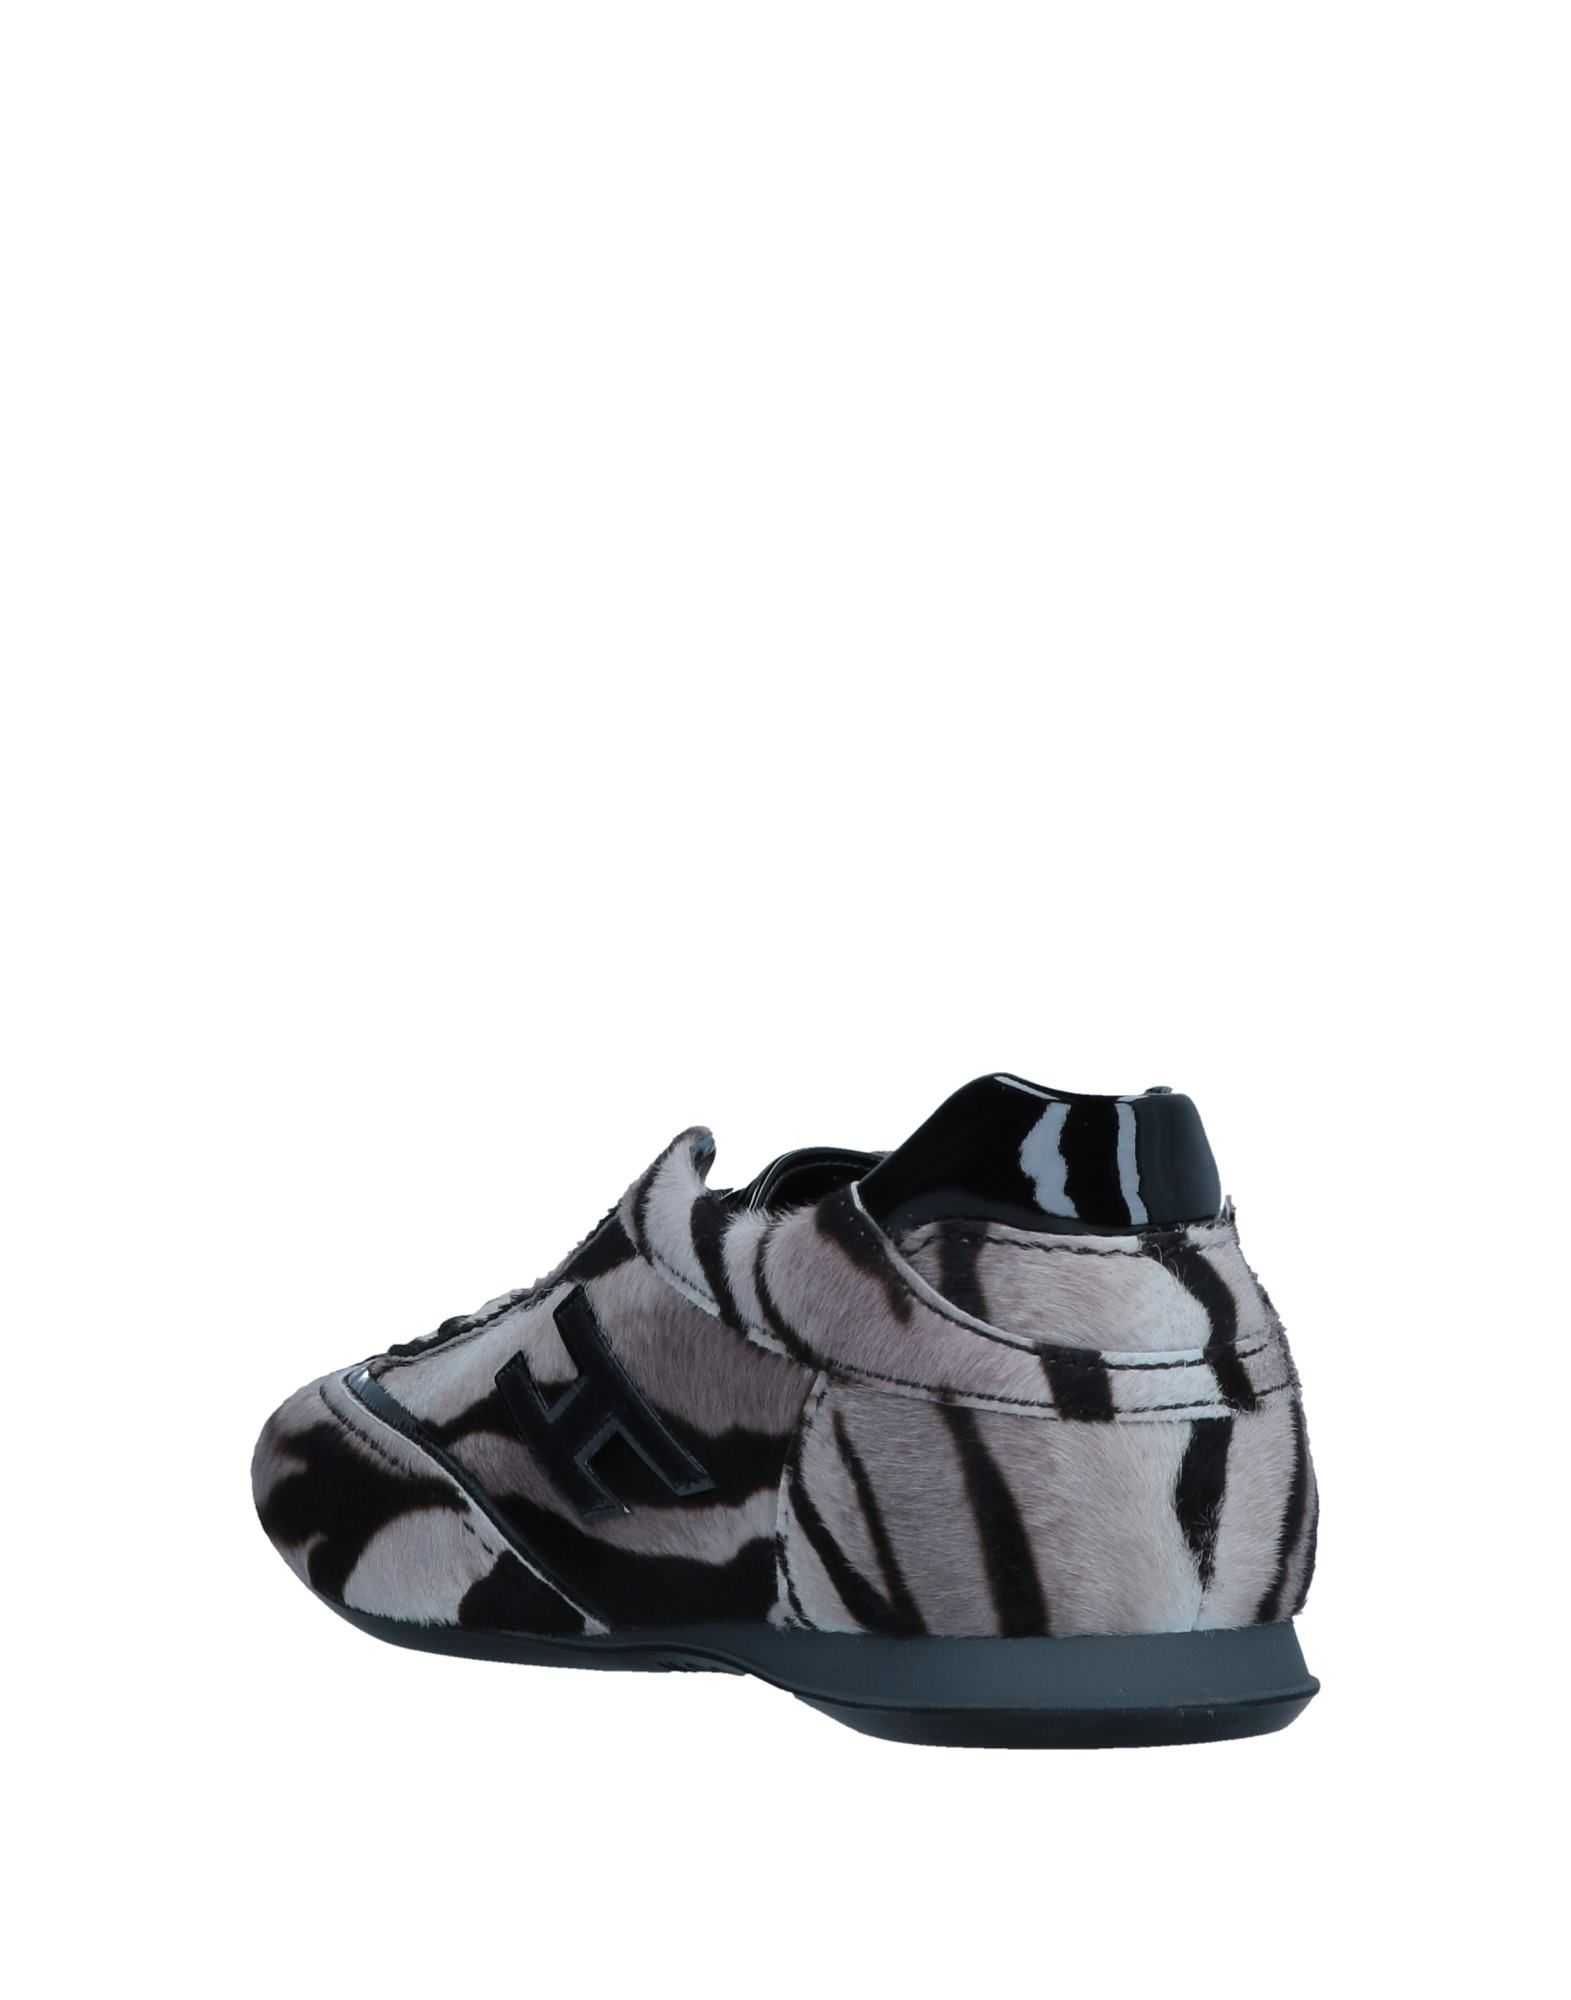 Hogan Sneakers - Women Women Women Hogan Sneakers online on  United Kingdom - 11543537BM f2f266